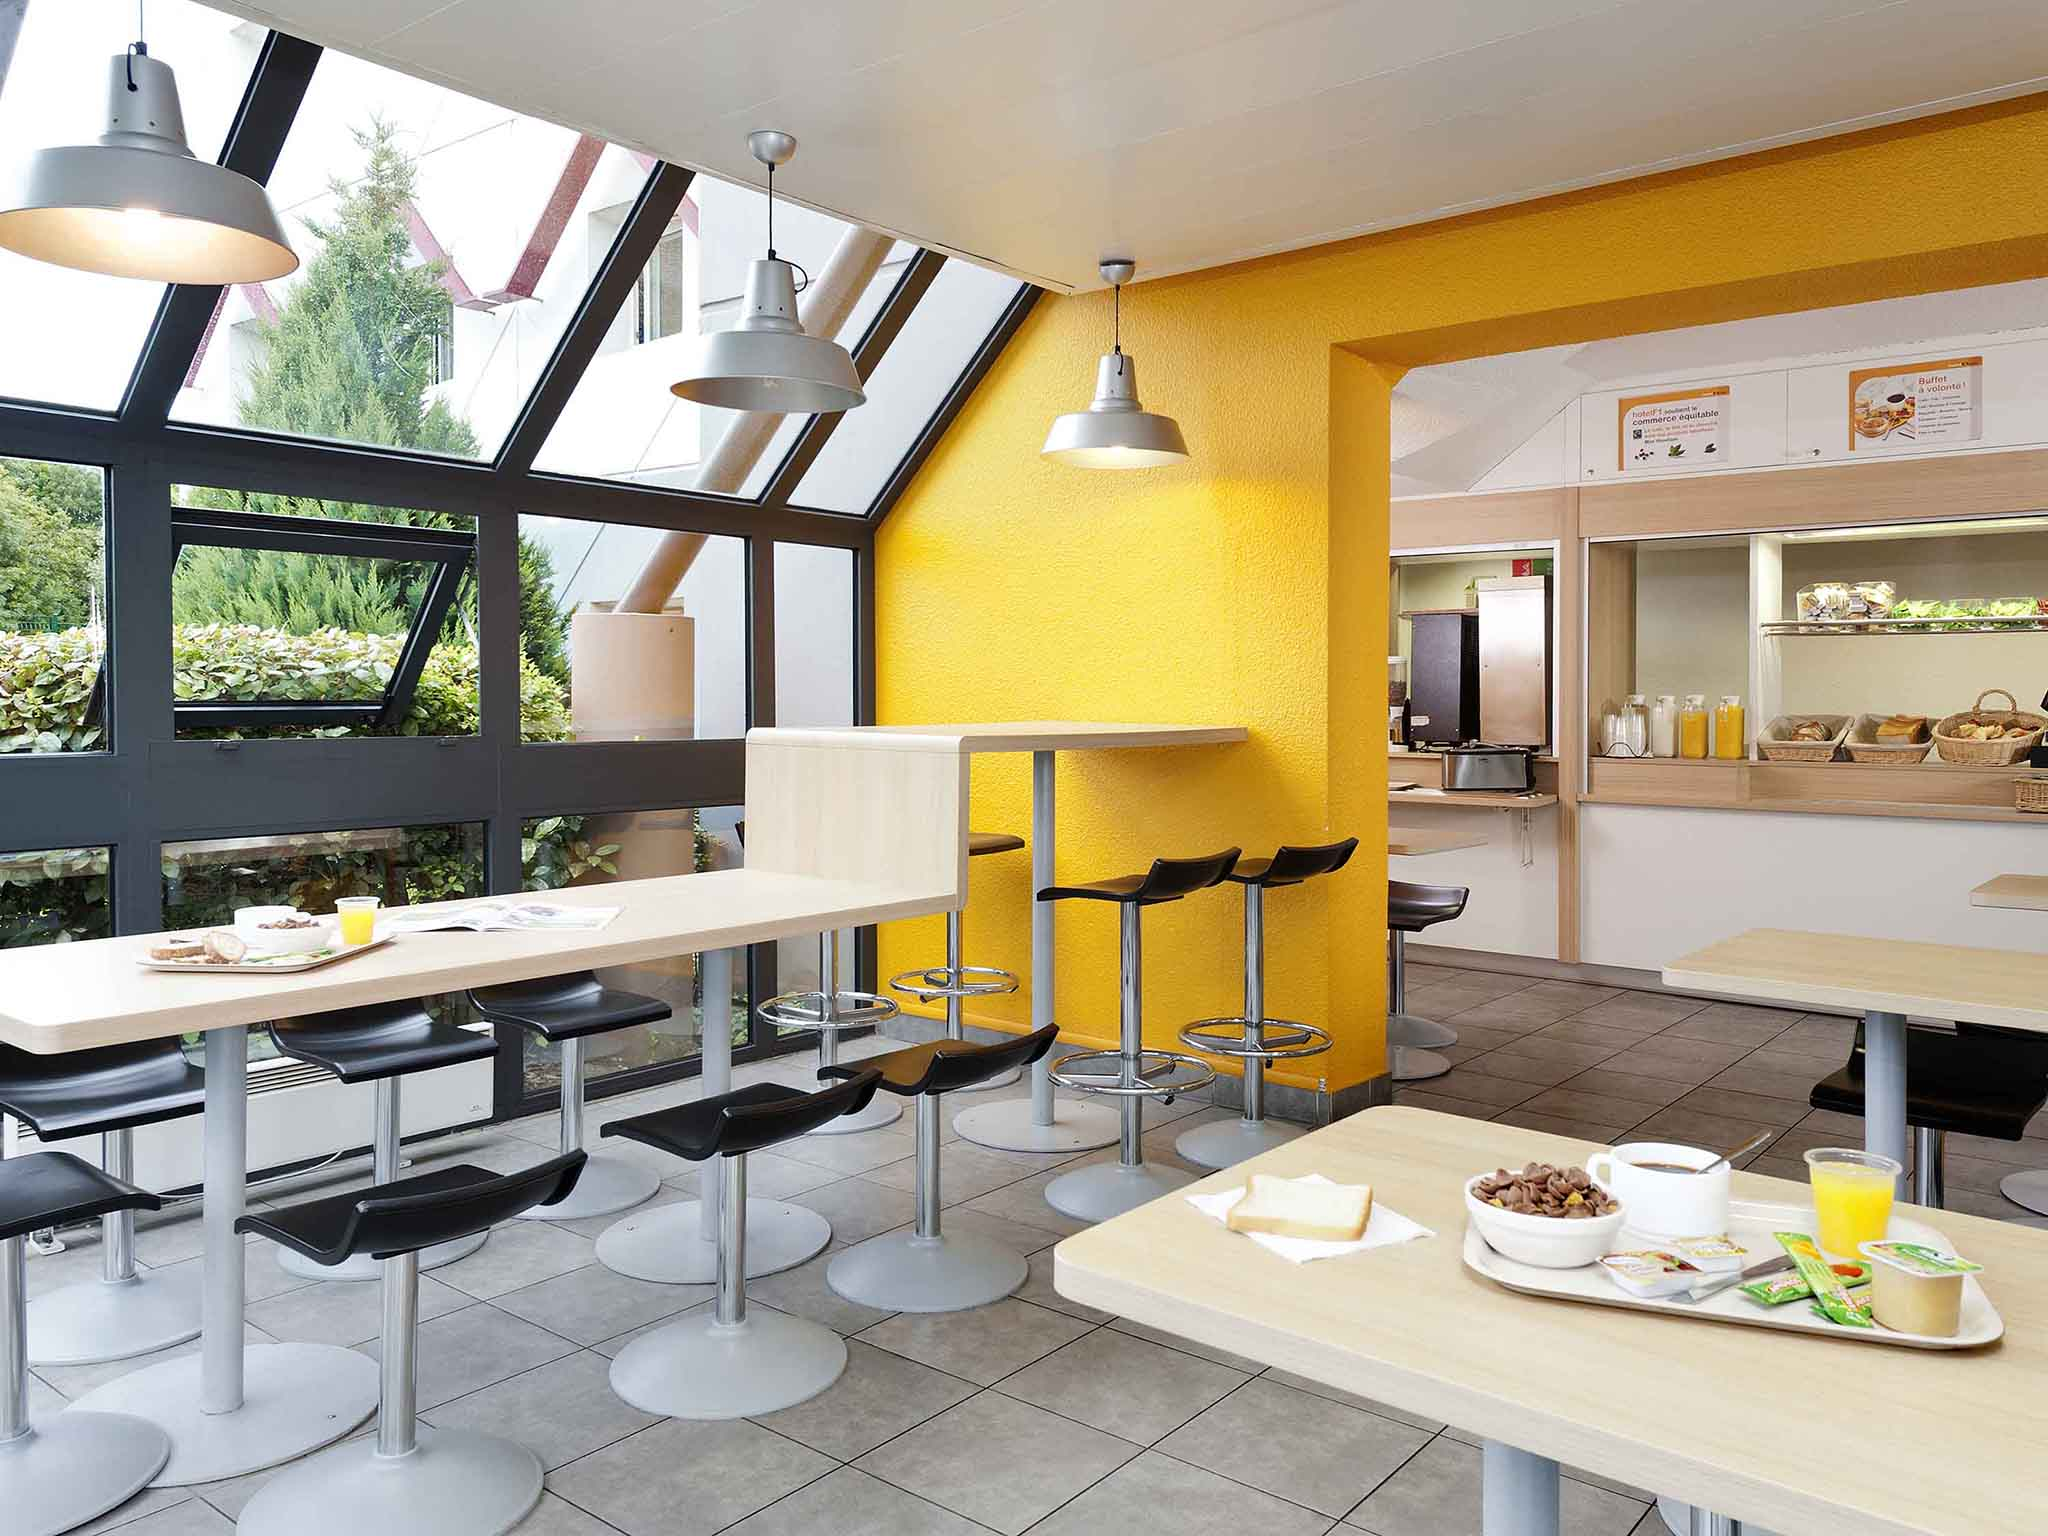 Photo N°4 : HOTEL F1 PERPIGNAN SUD